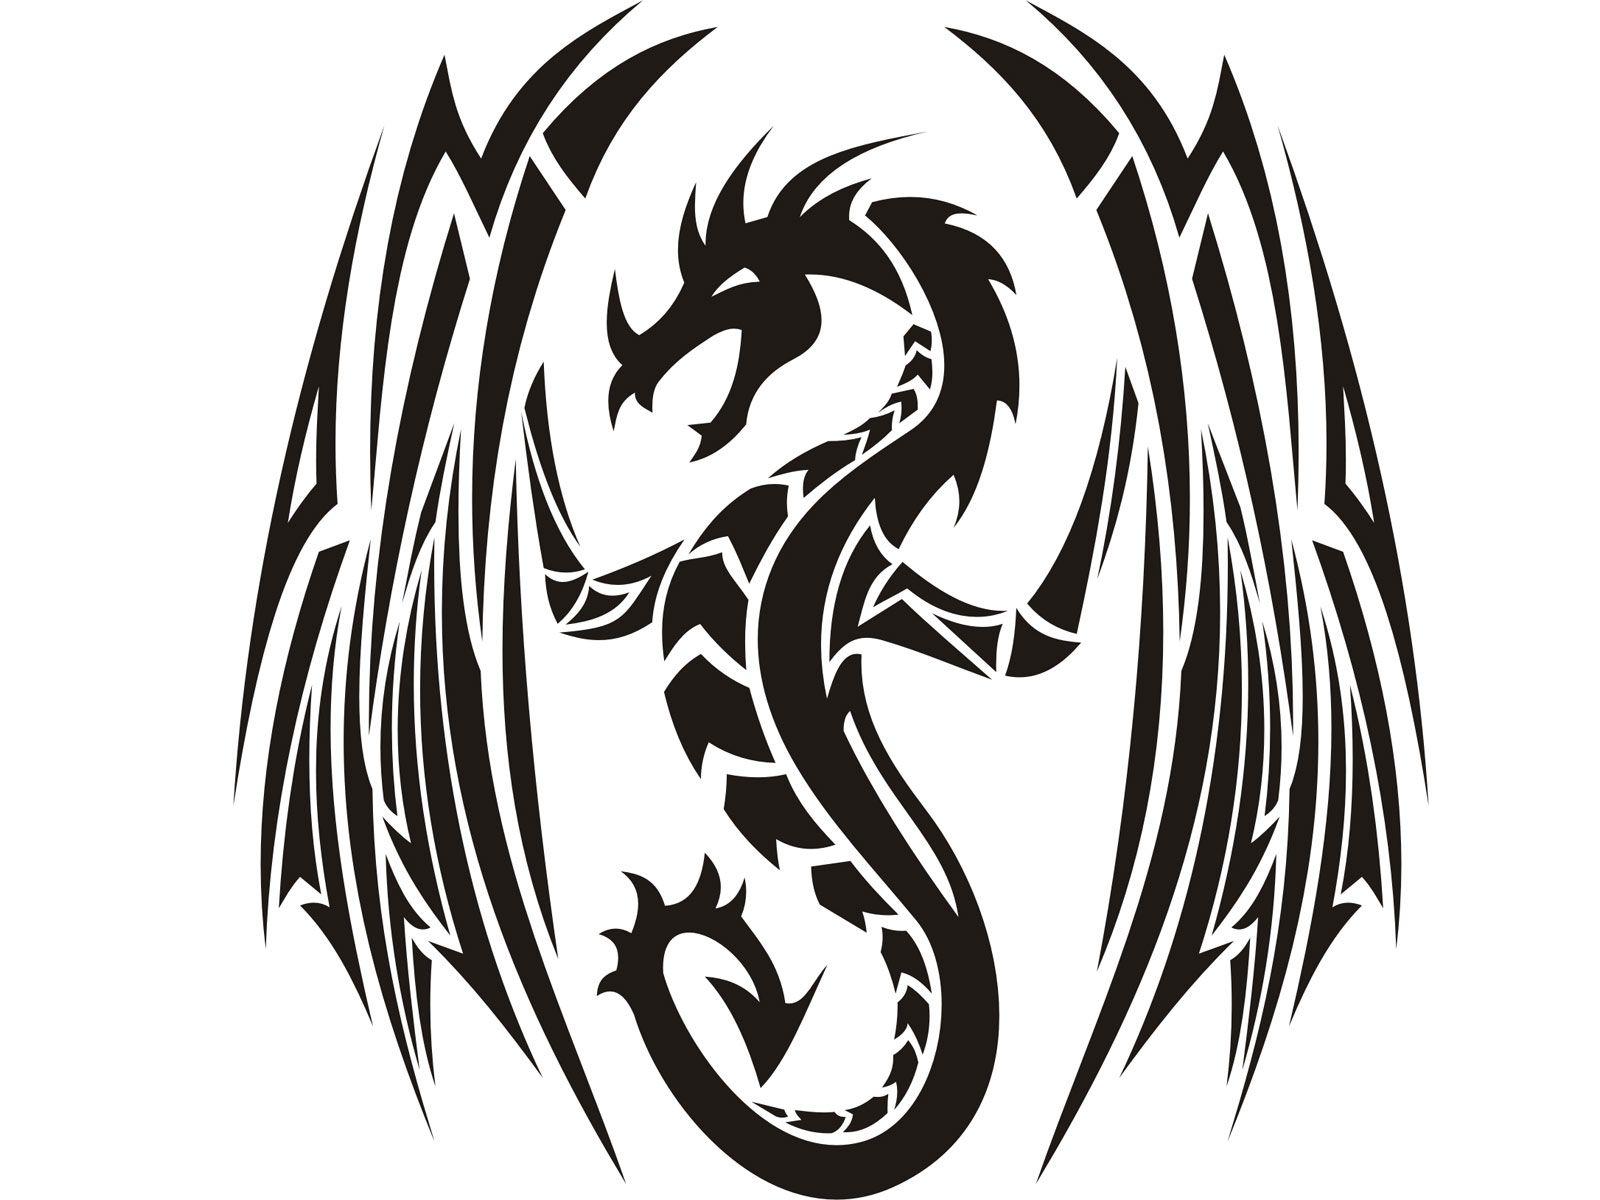 1600x1200 Tattoos Awesome Tribal Dragon Tattoo Designs Red Dragons